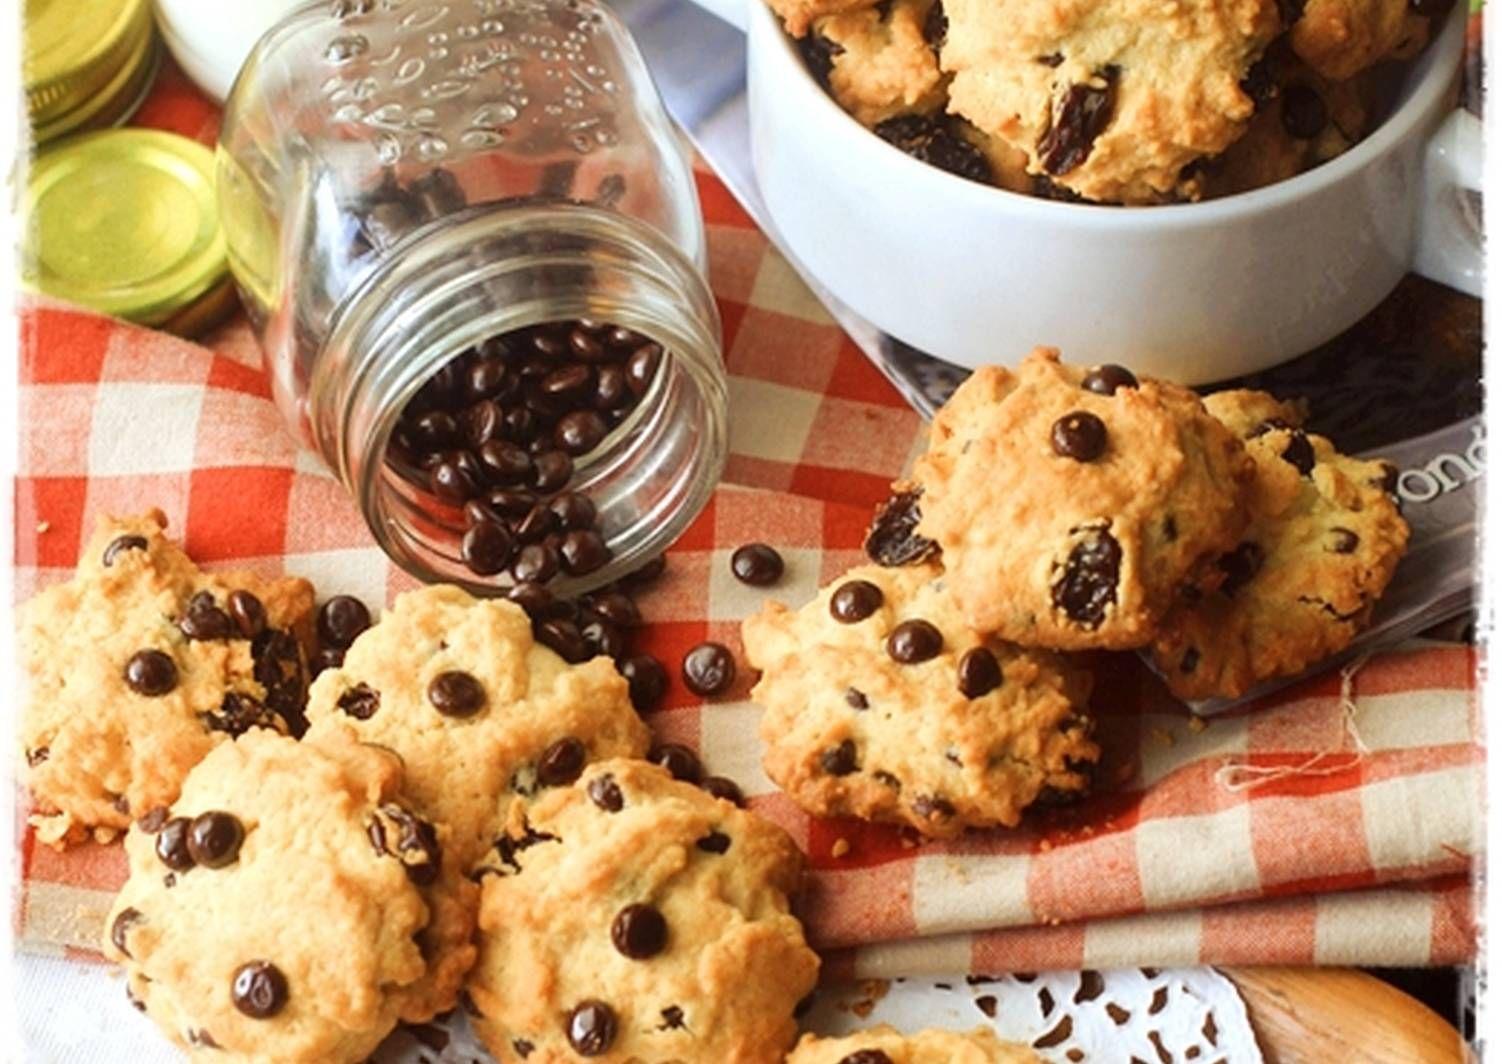 Resep Vanila Chocochips Cookies Simpel Renyahh Oleh Tintin Rayner Resep Resep Biskuit Kue Kering Mentega Makanan